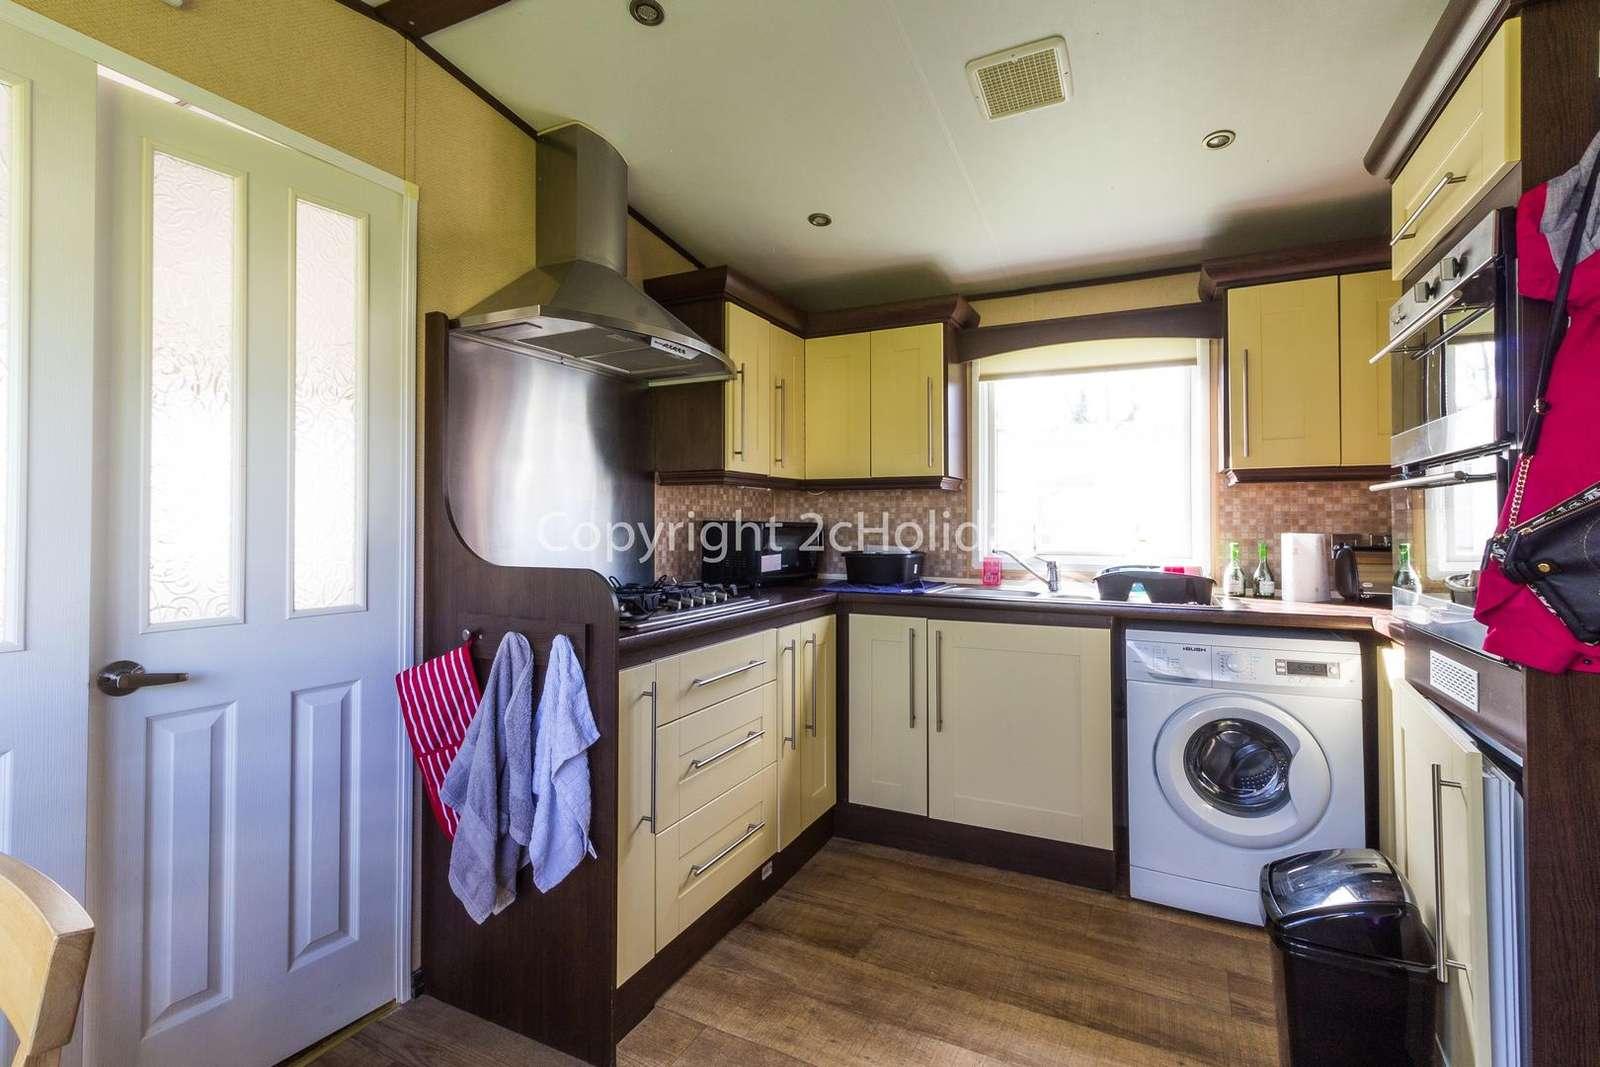 Spacious kitchen with a washing machine!